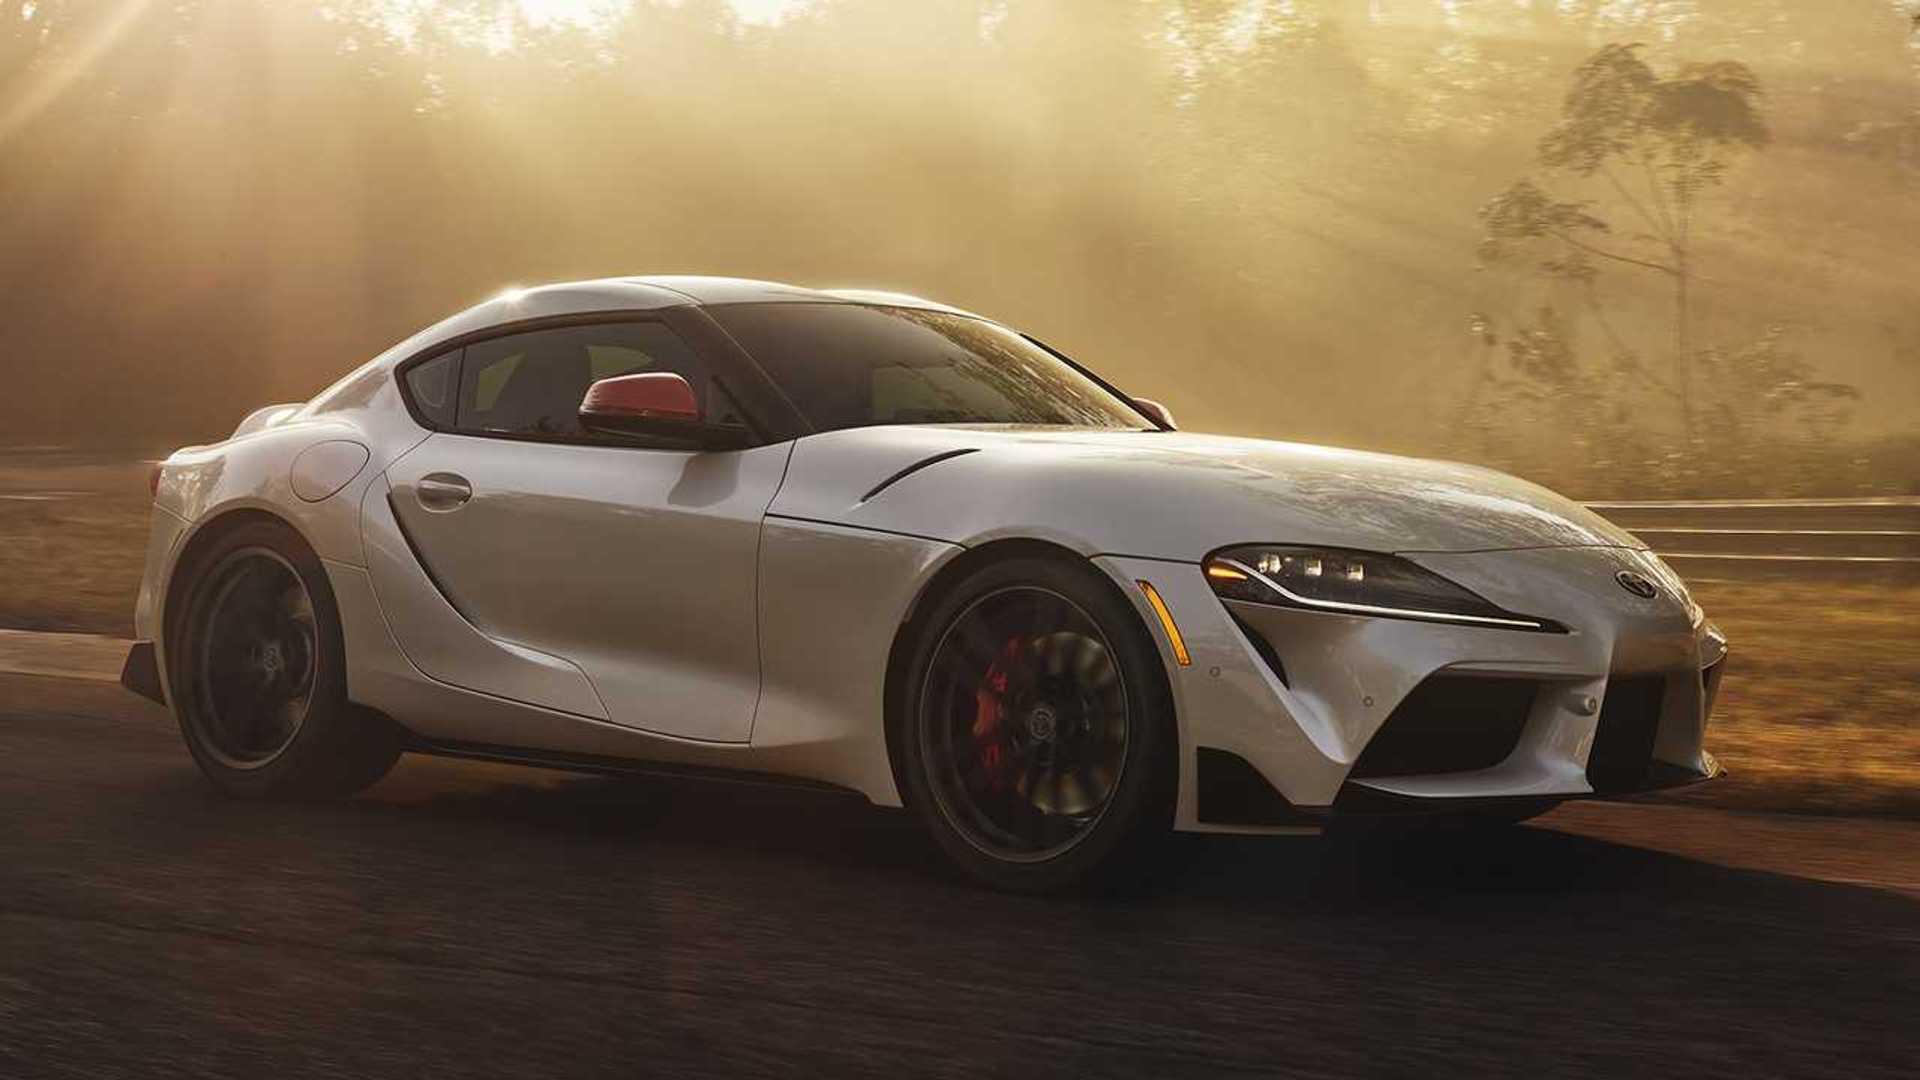 2020 Toyota Supra Color Options Revealed